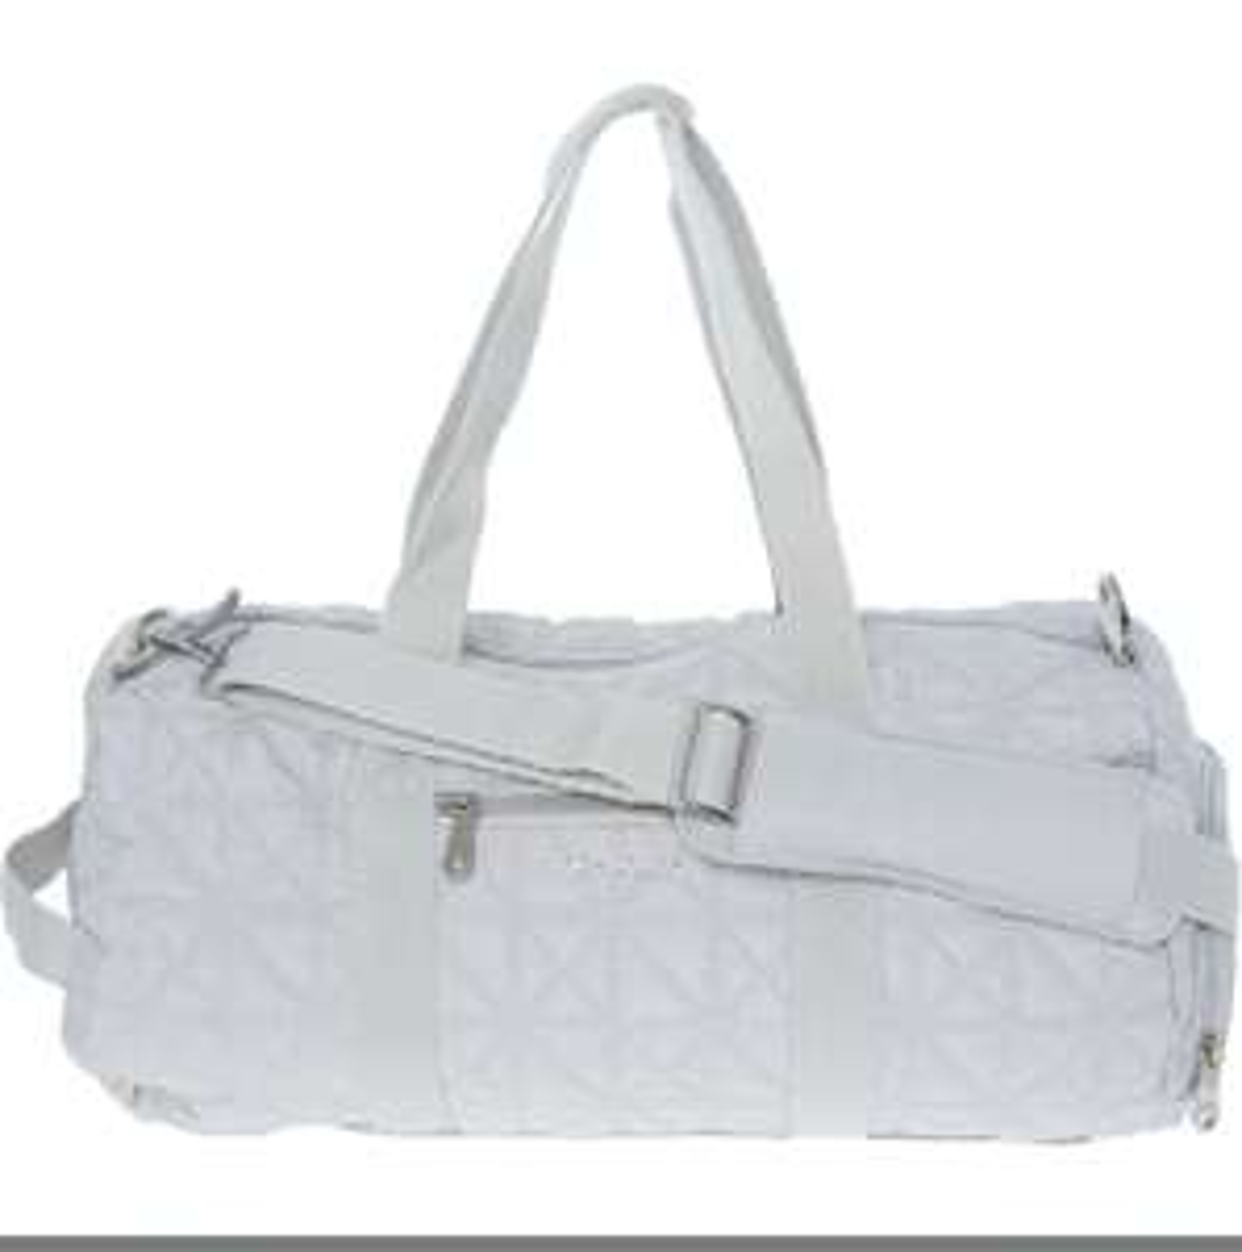 FIORELLI Grey Quilted Lunar Rock Duffle Bag @ tk maxx for £15